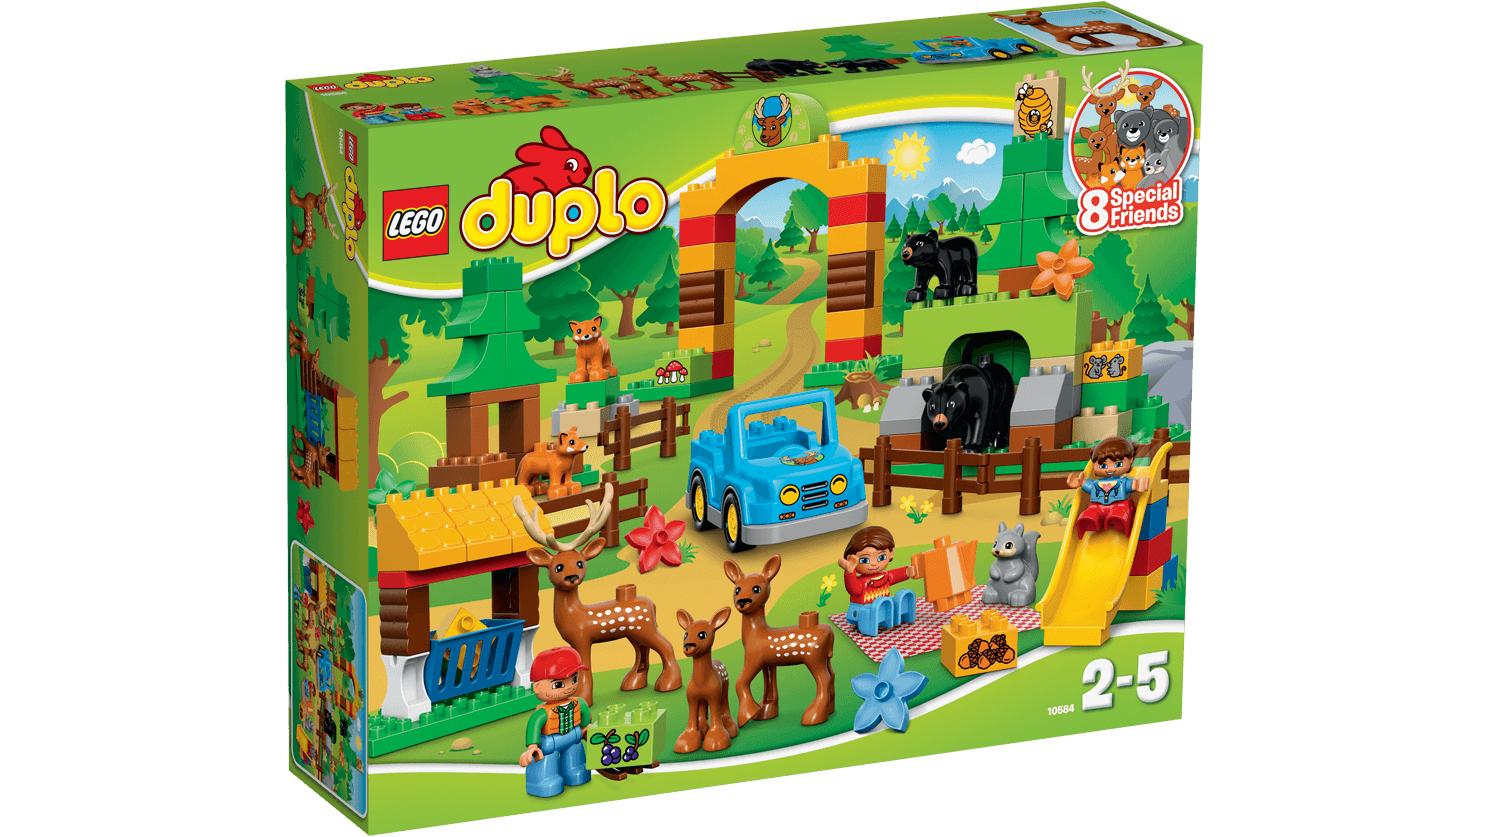 Real 20 % Rabatt auf LEGO - Duplo